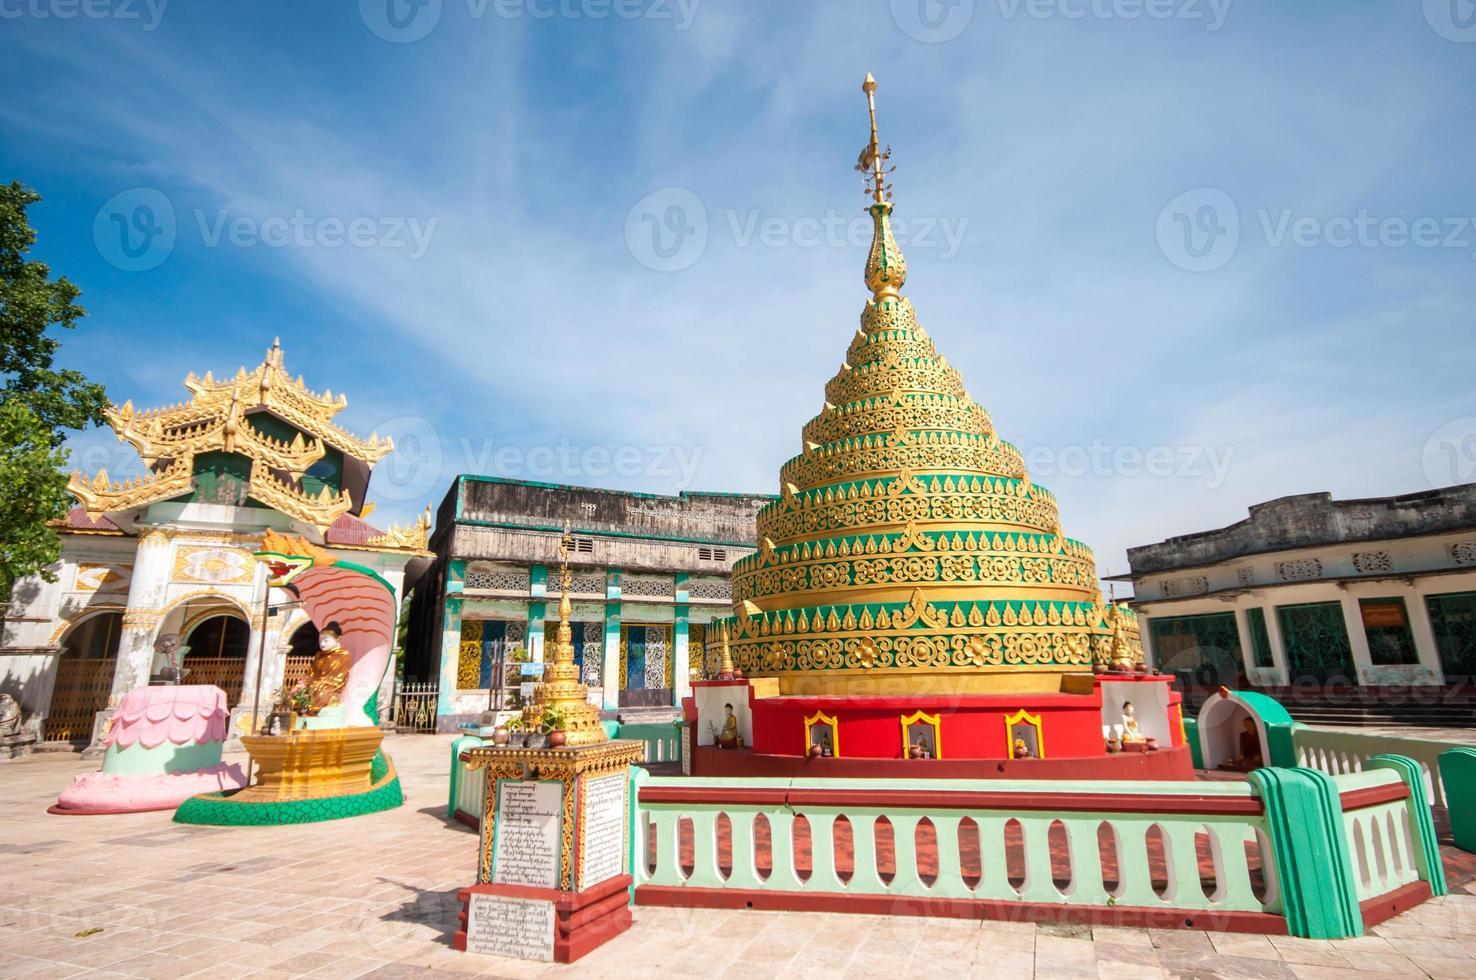 myanmar temple photo